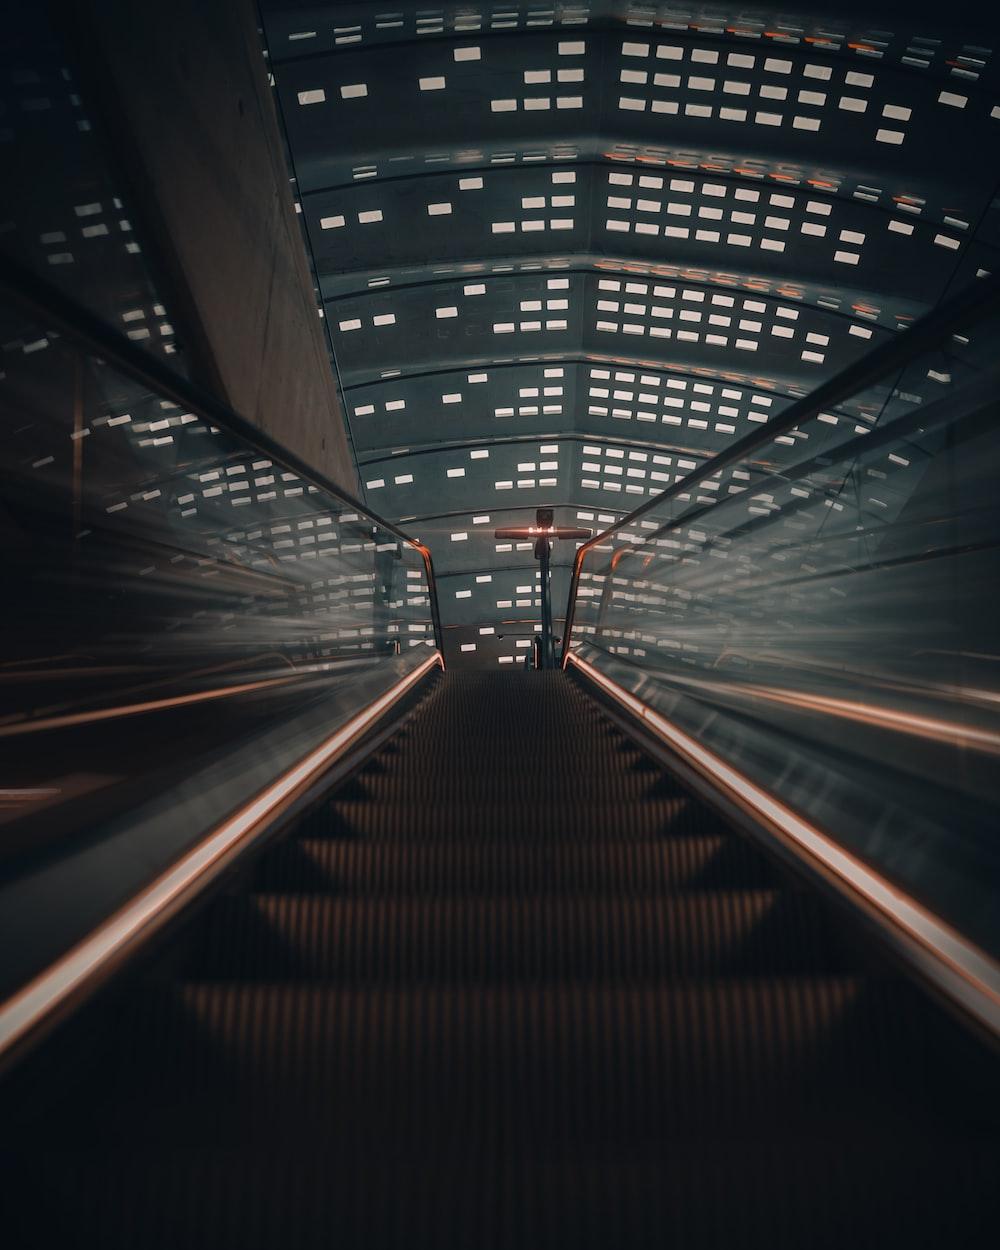 gray and white escalator